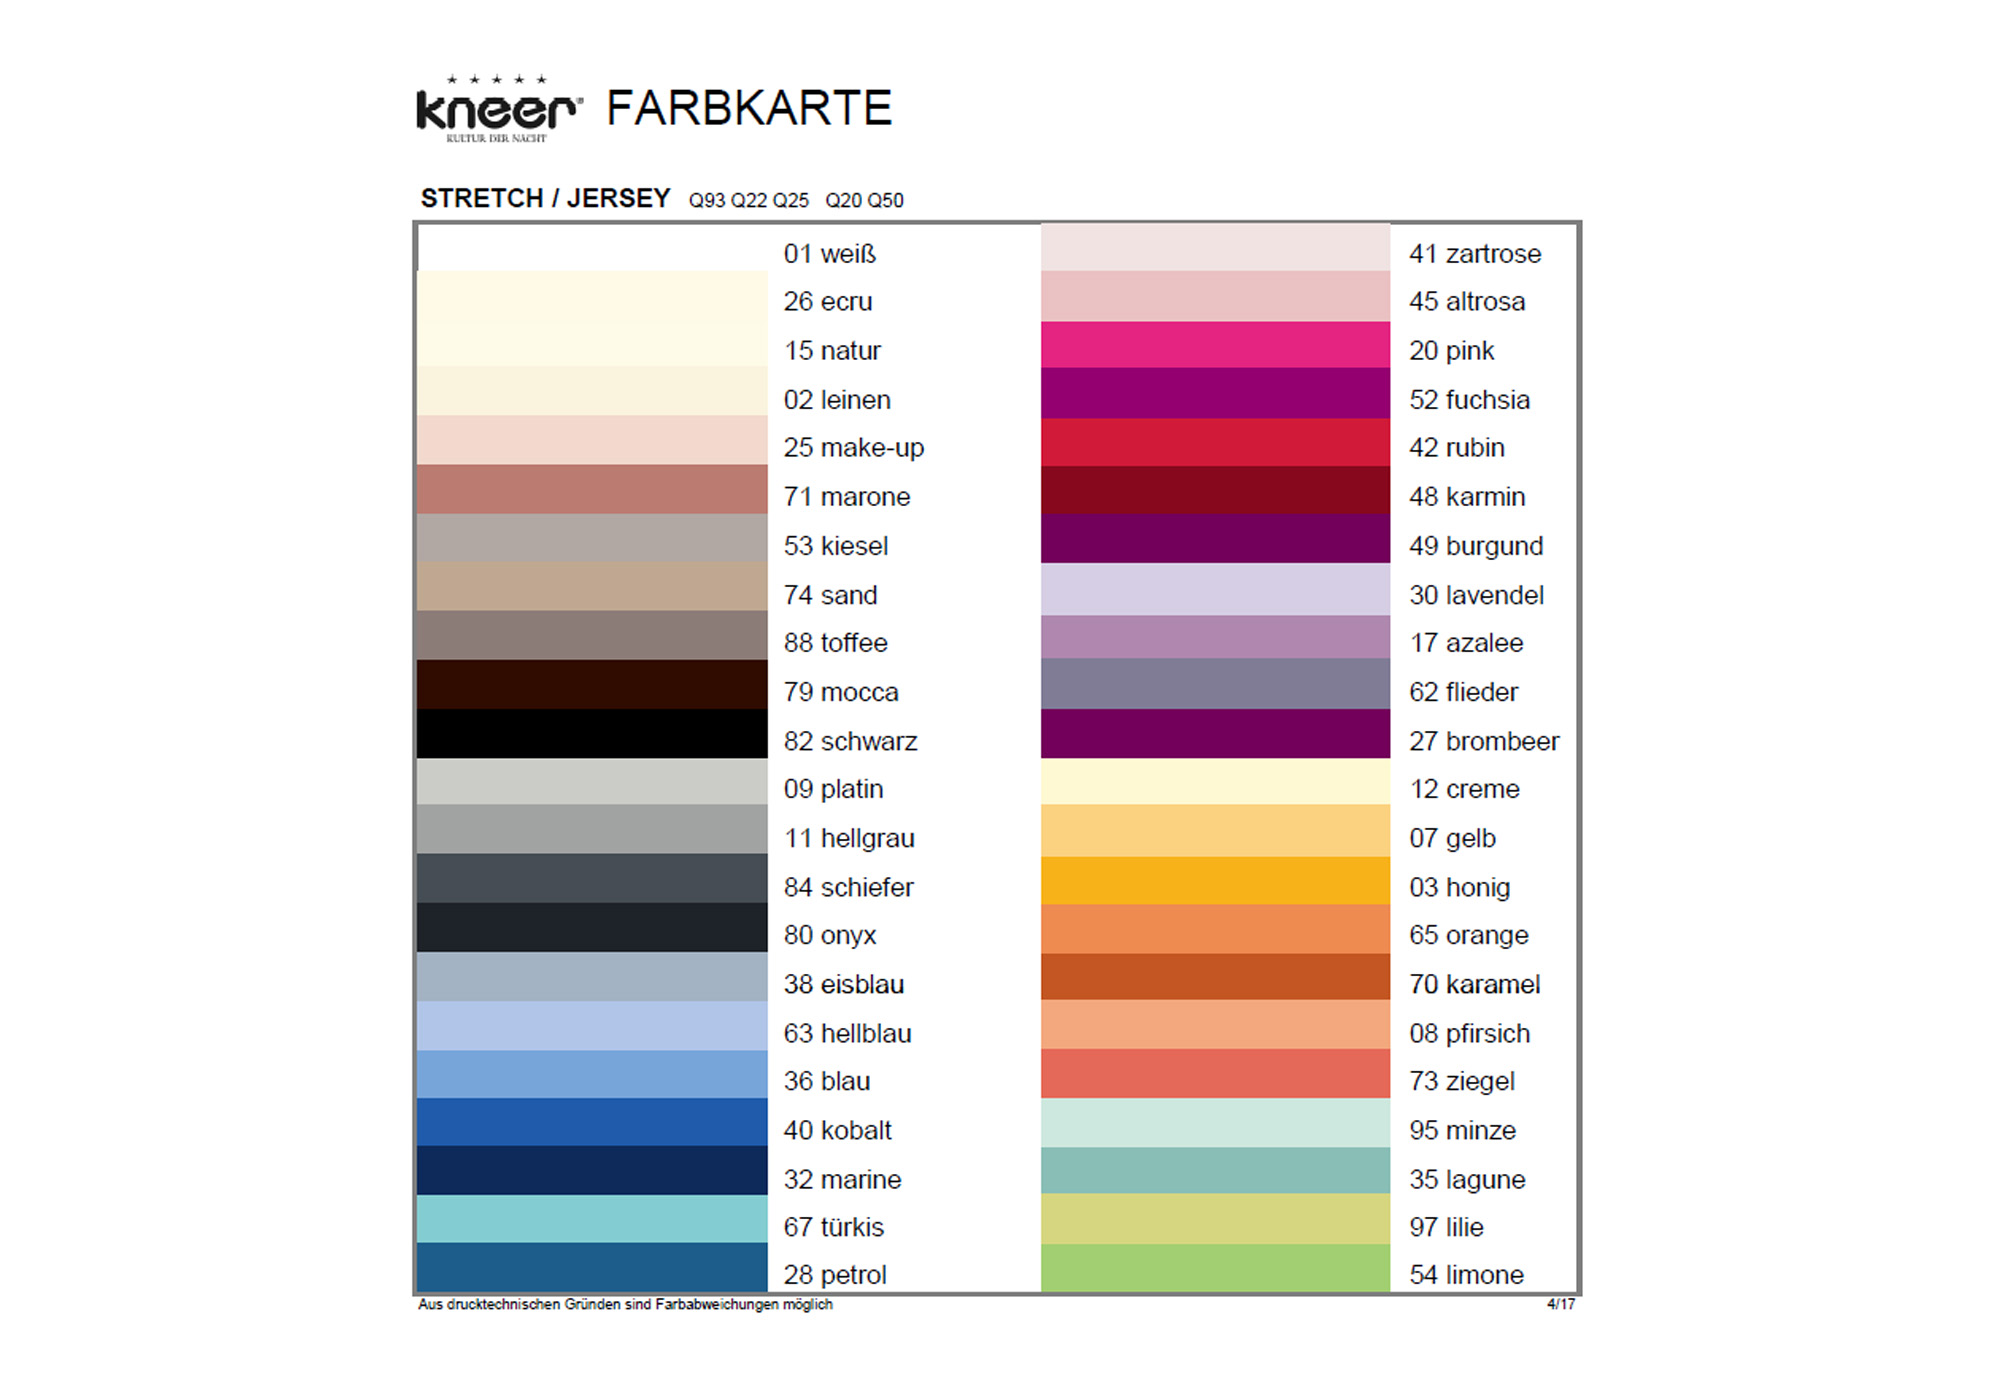 Kneer Farbkarte Q93